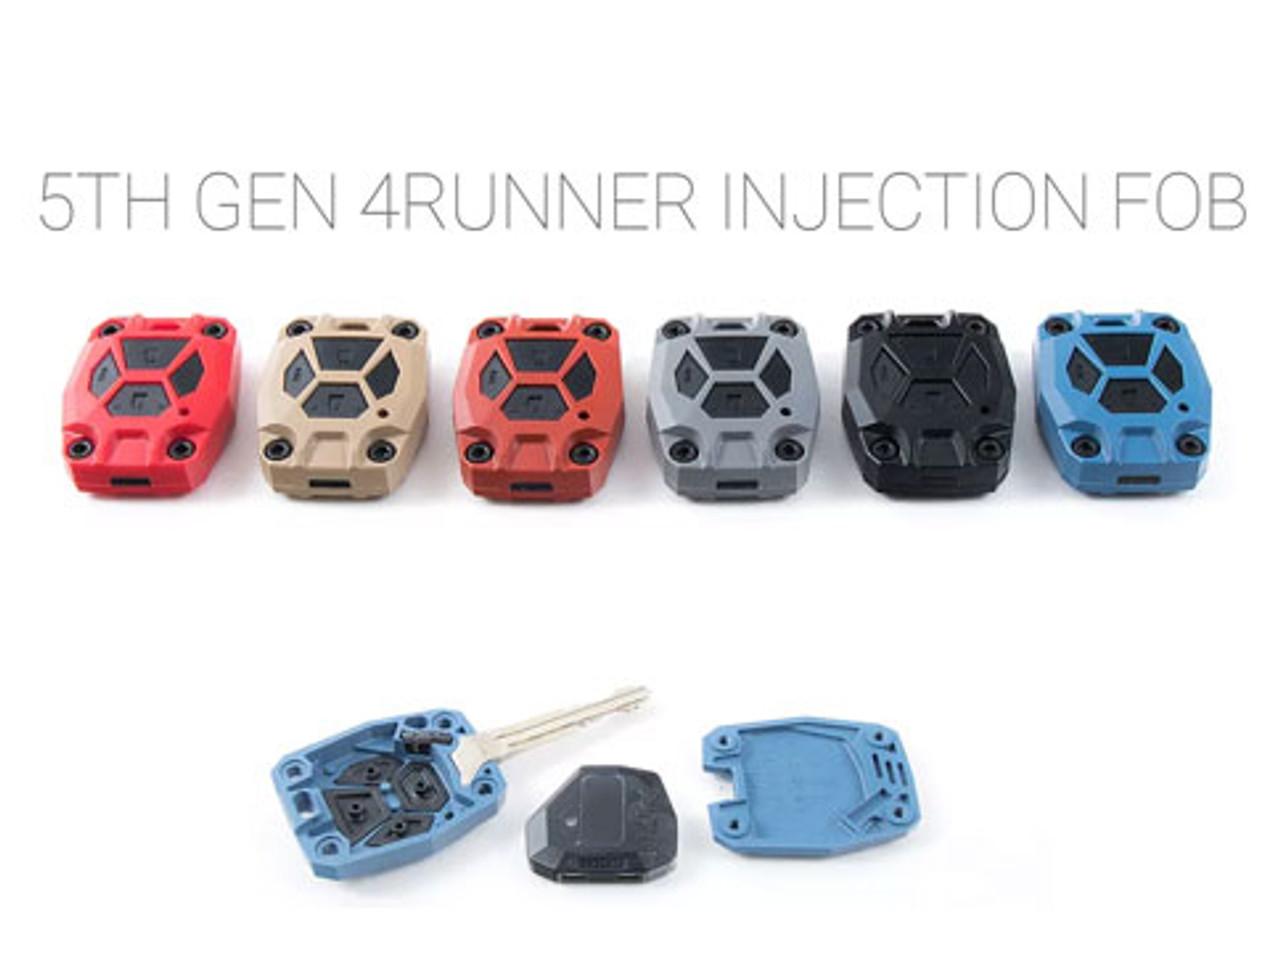 4Runner Injection Fob (5th Gen.)